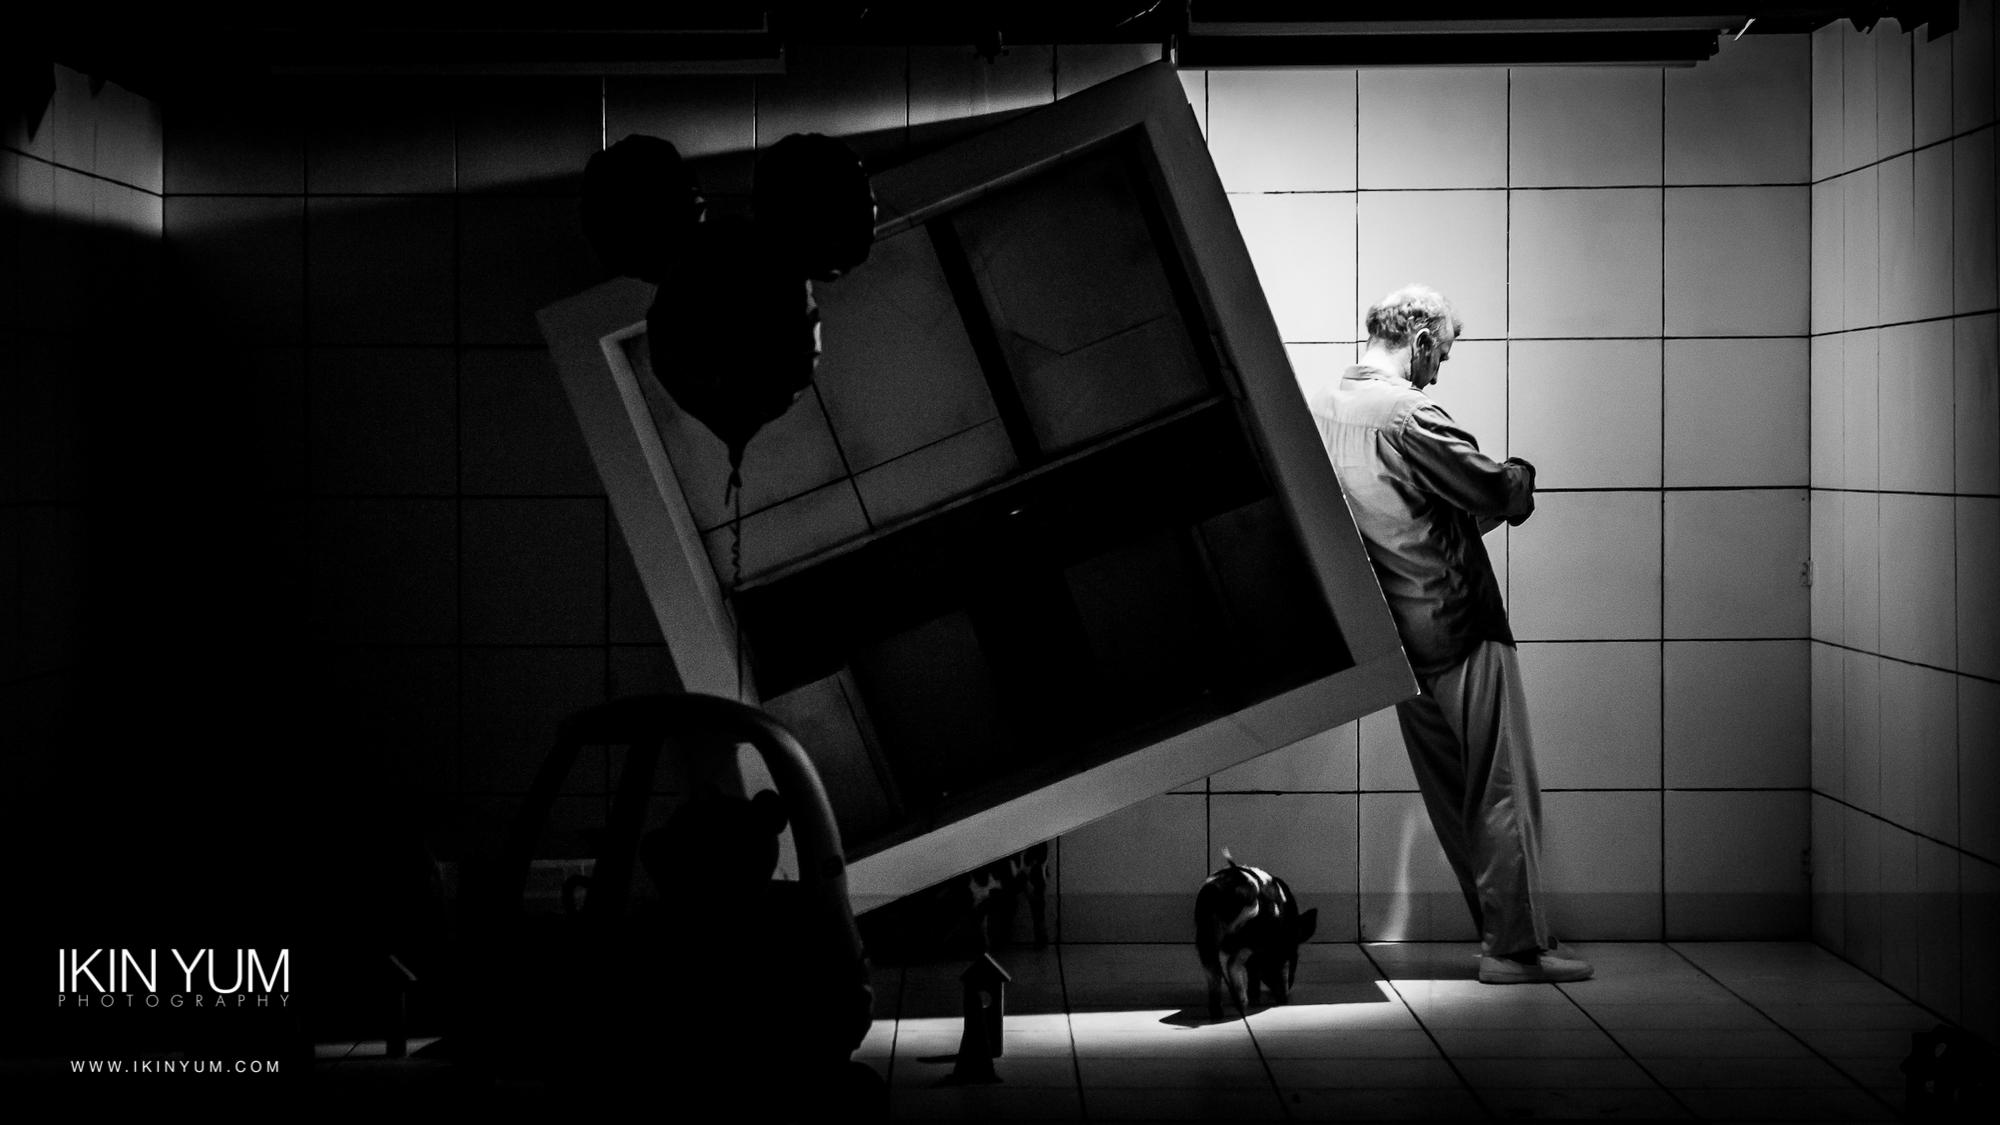 Goya - Gate theatre - Ikin Yum Photography-070.jpg